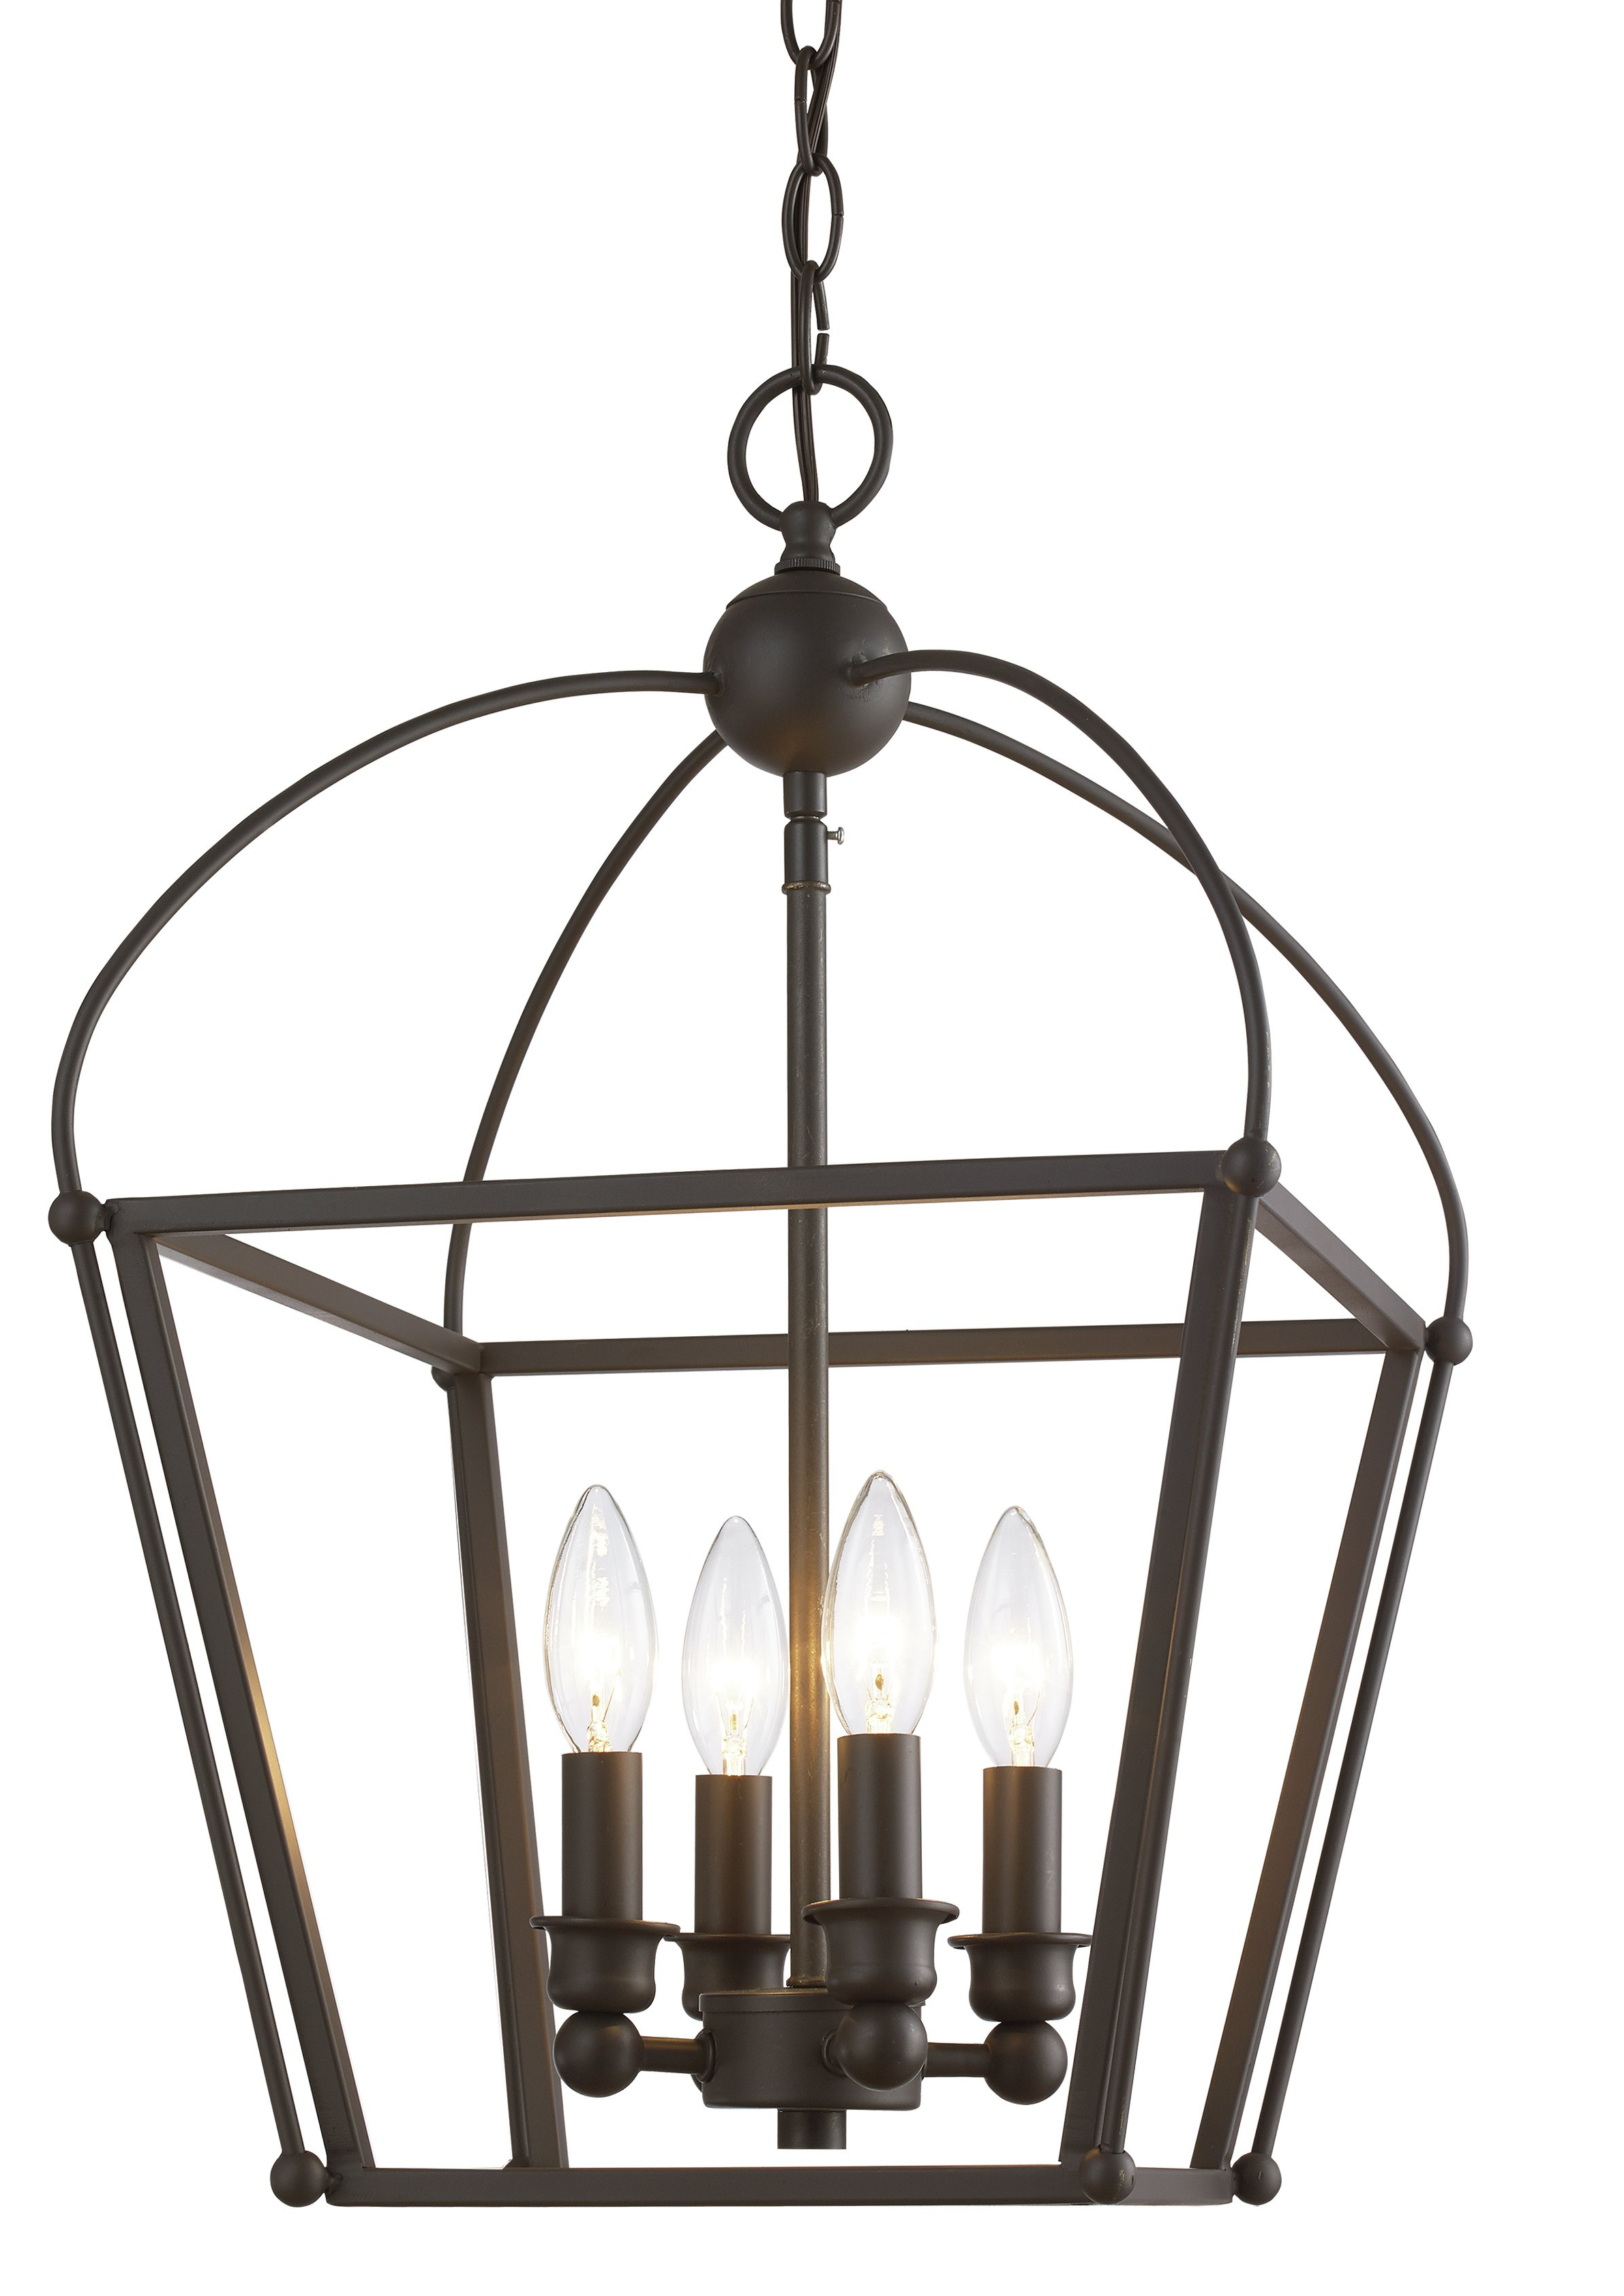 2019 Gladding 4 Light Foyer Lantern Pendant Throughout Varnum 4 Light Lantern Pendants (View 1 of 20)